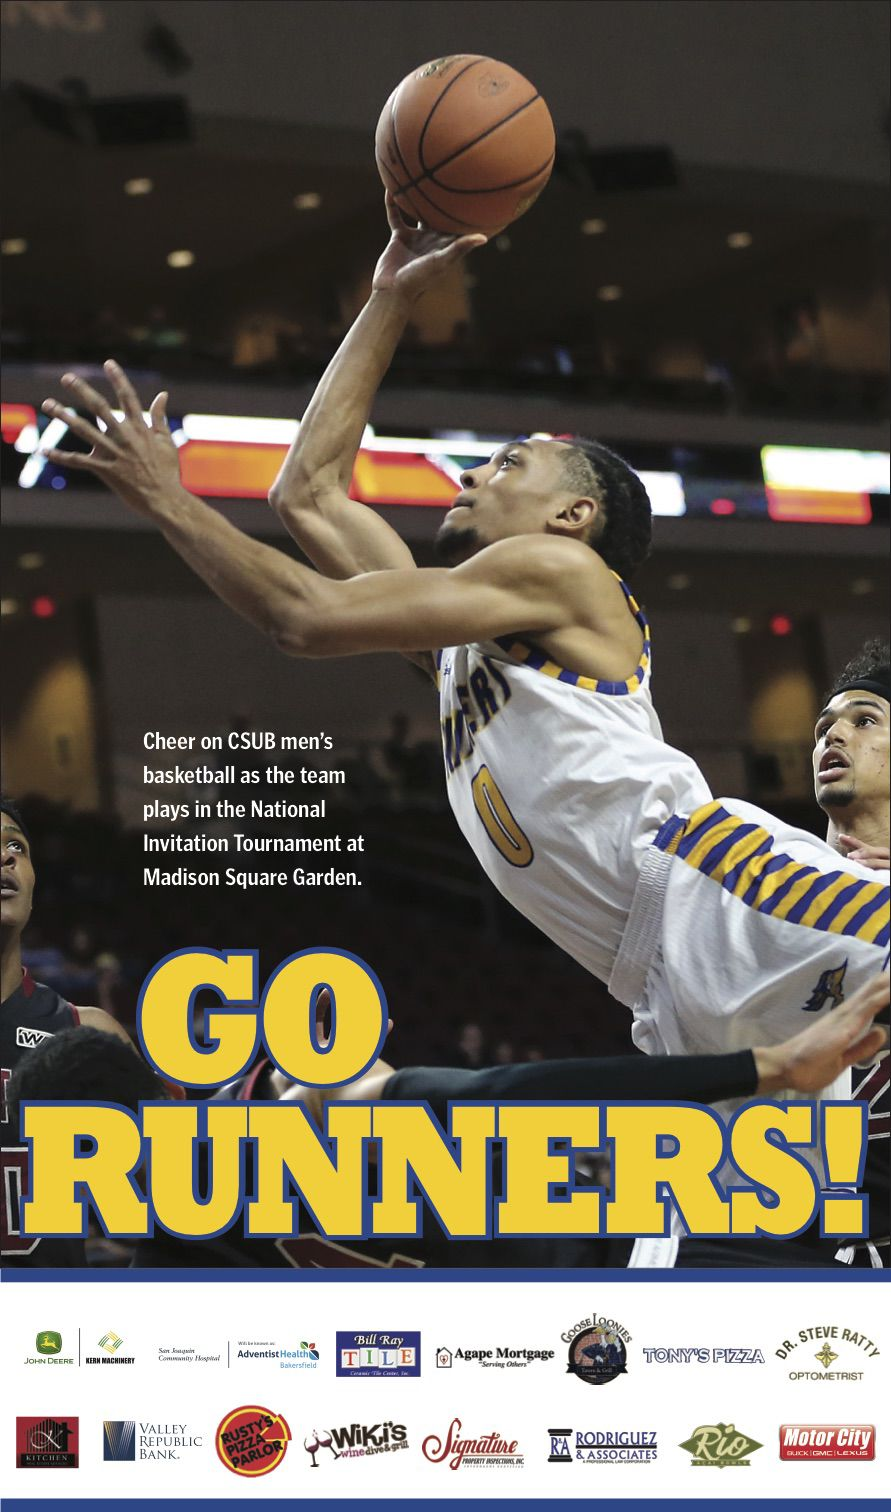 CSUB Go Runners Poster